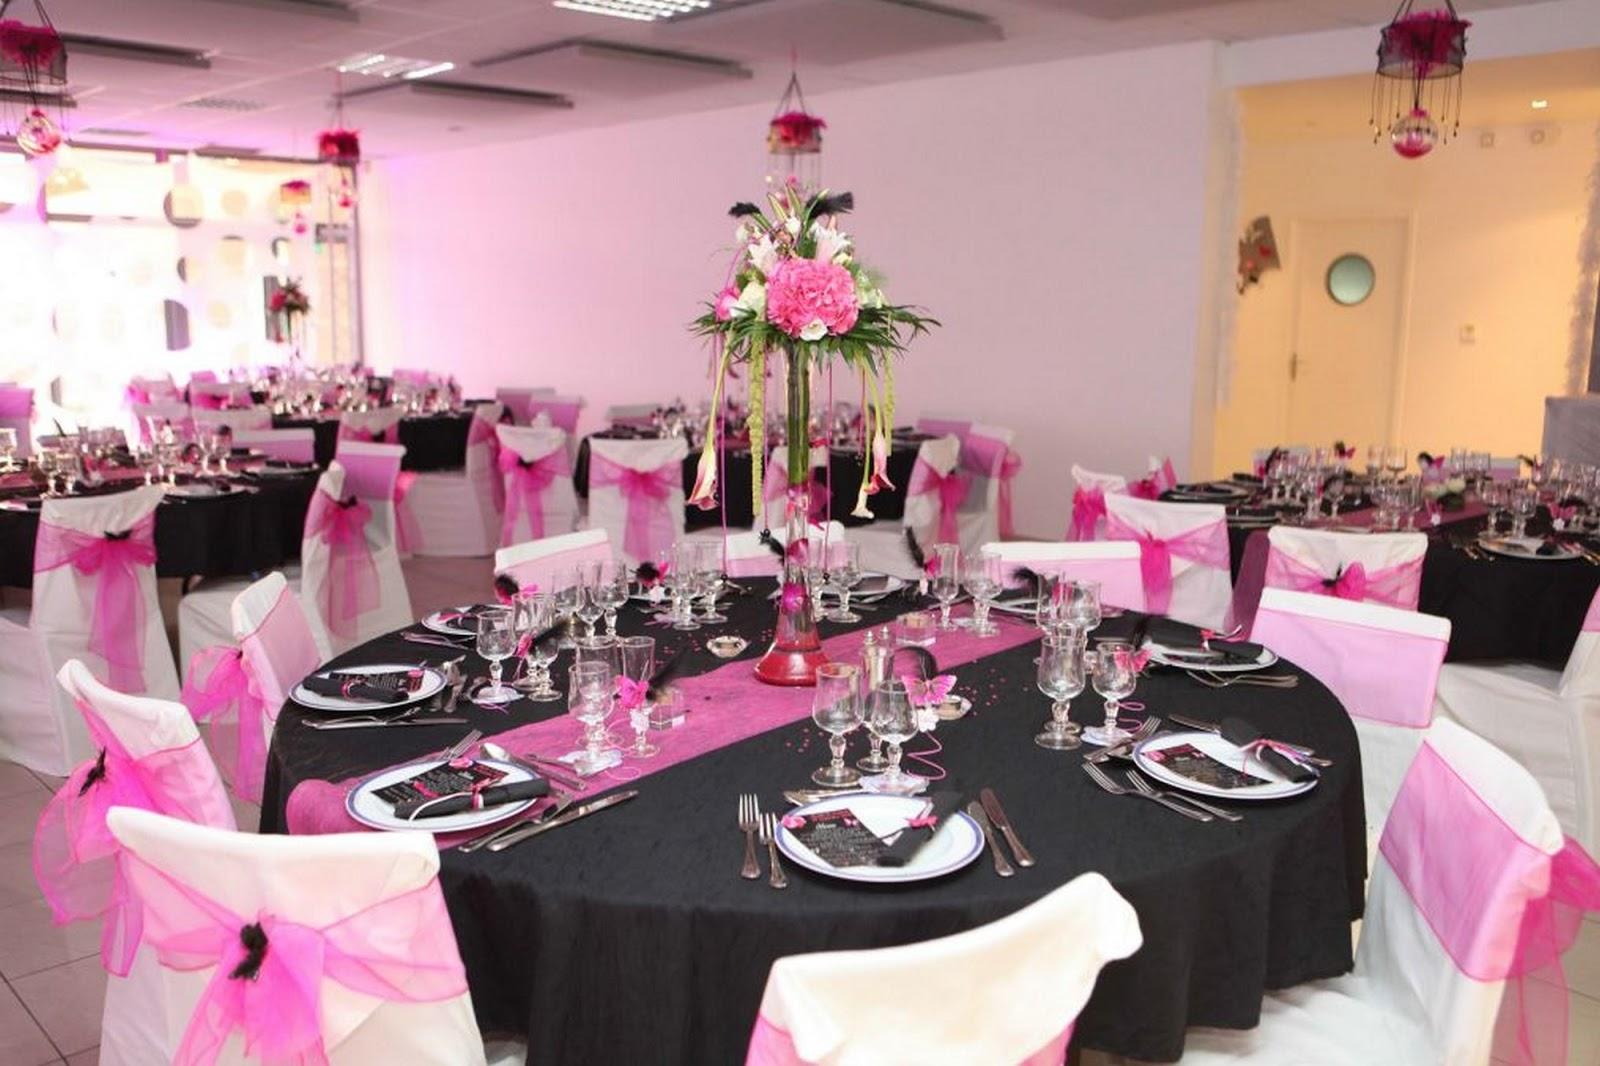 id et photo d coration mariage decoration salle mariage luxe idee decoration salle mariage. Black Bedroom Furniture Sets. Home Design Ideas